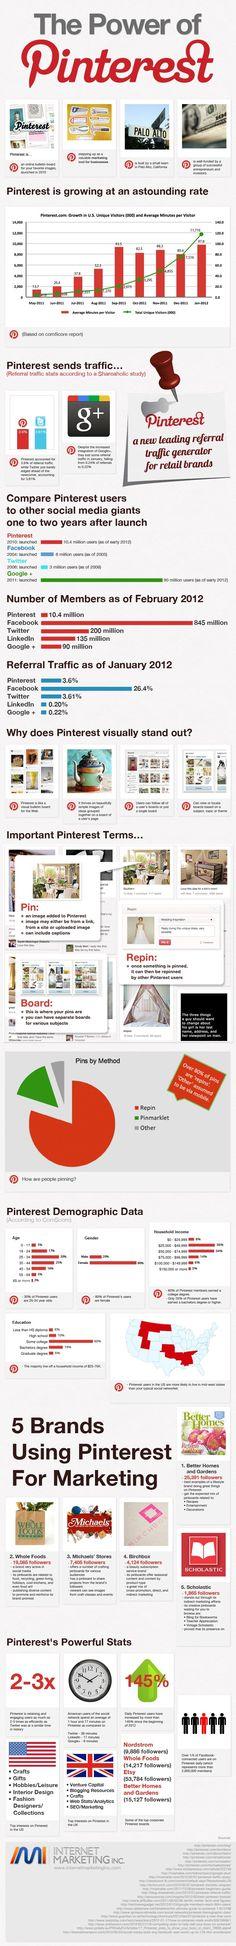 The Power of Pinterest